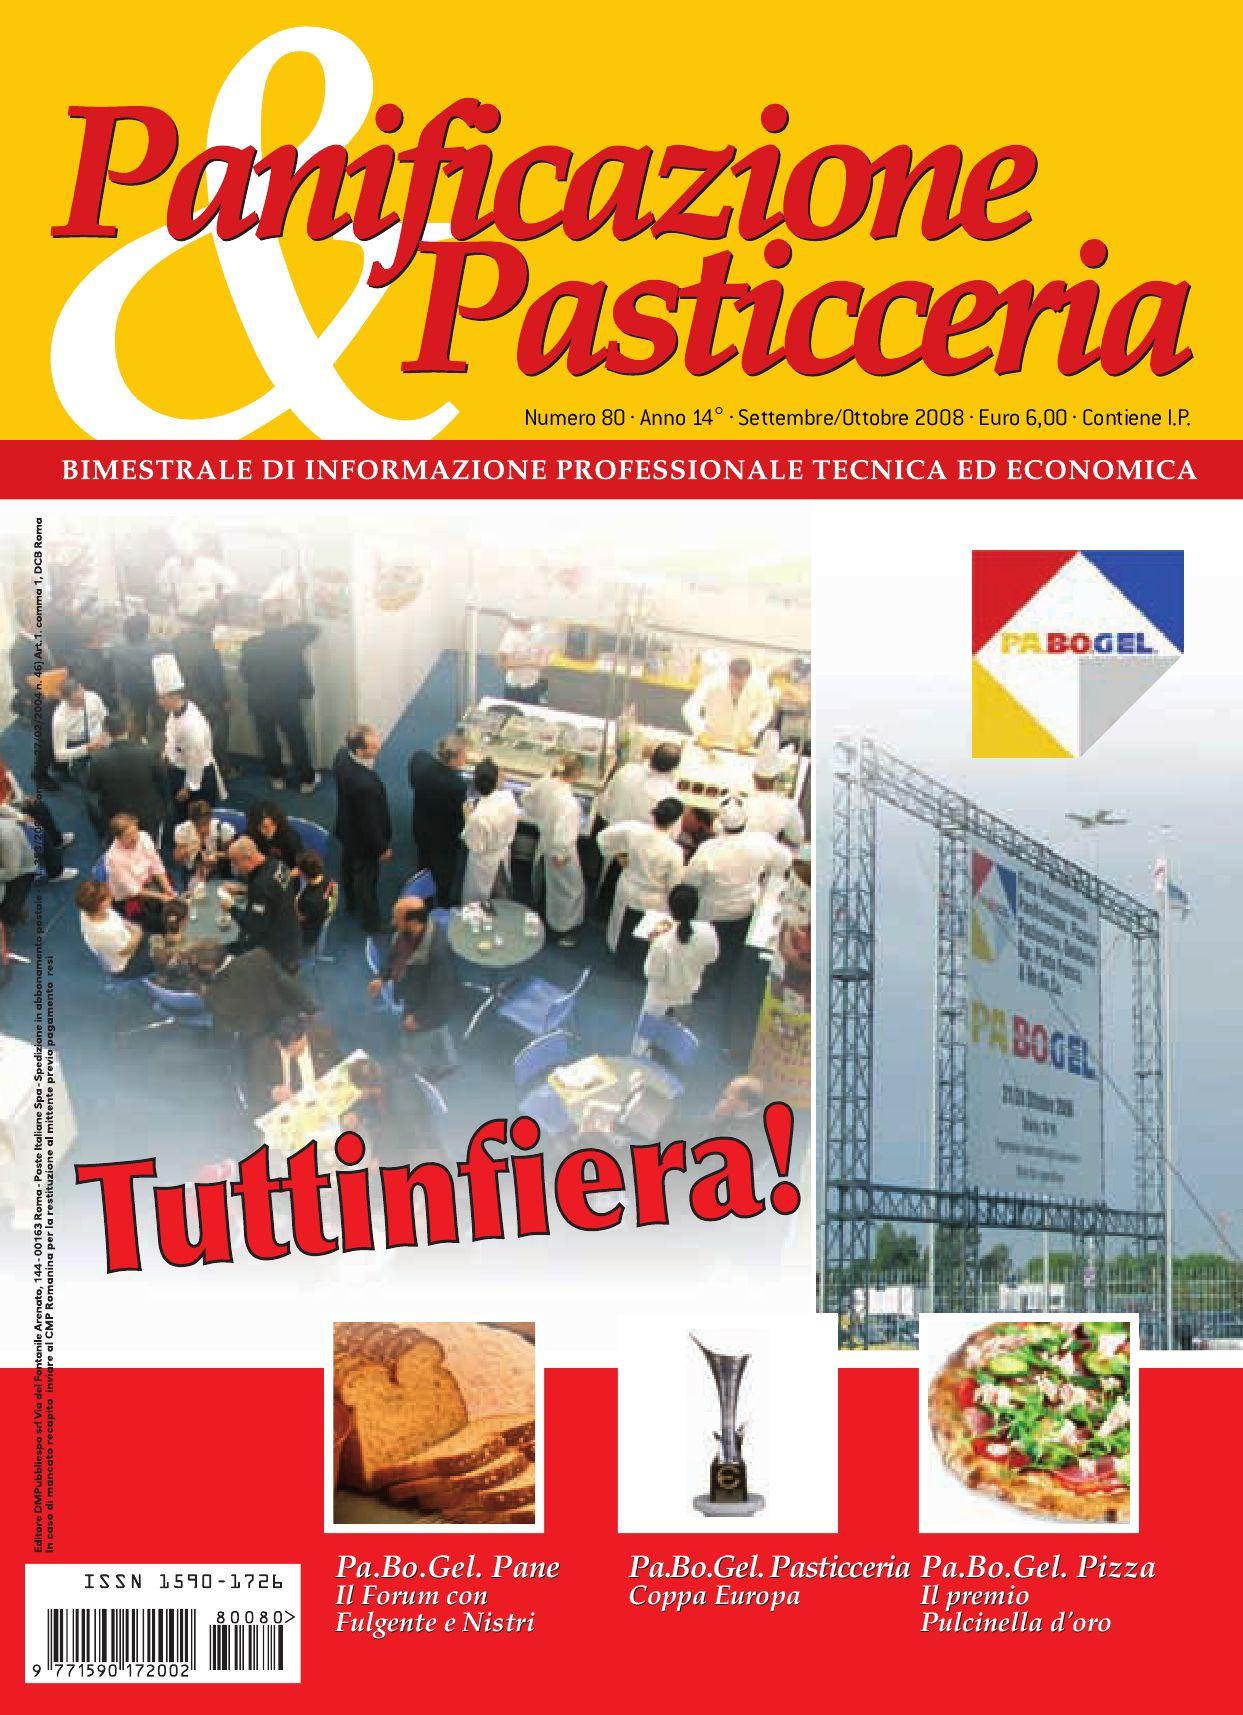 Panificazione&Pasticceria Nr 80 Sett Ott 2008 By D M P SRL Issuu